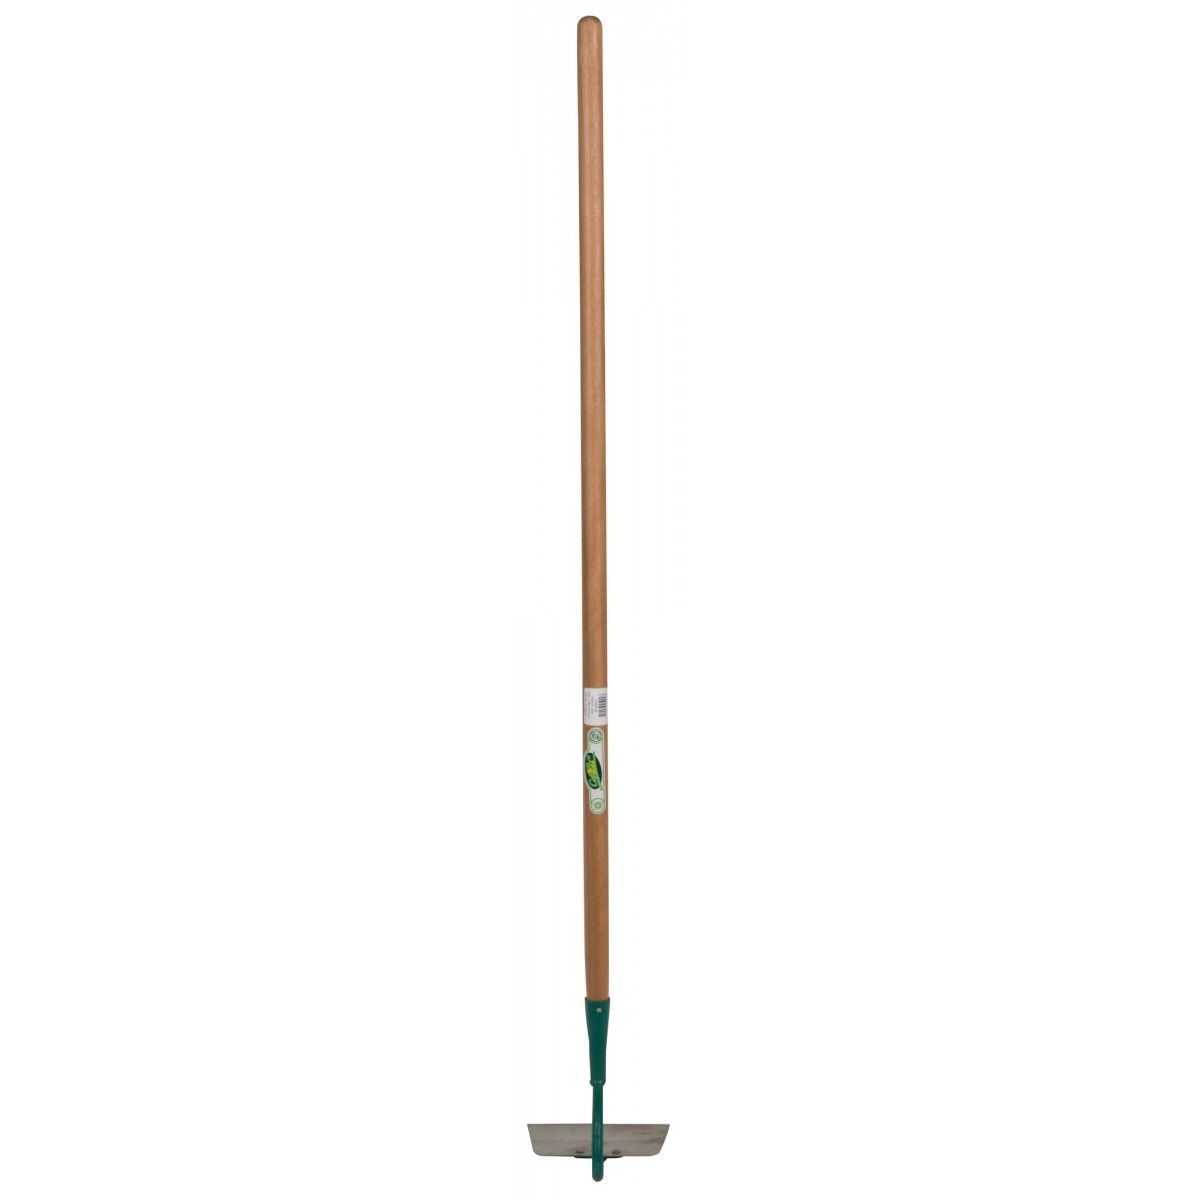 Binette nanterre Cap Vert - 16 cm - Emmanché